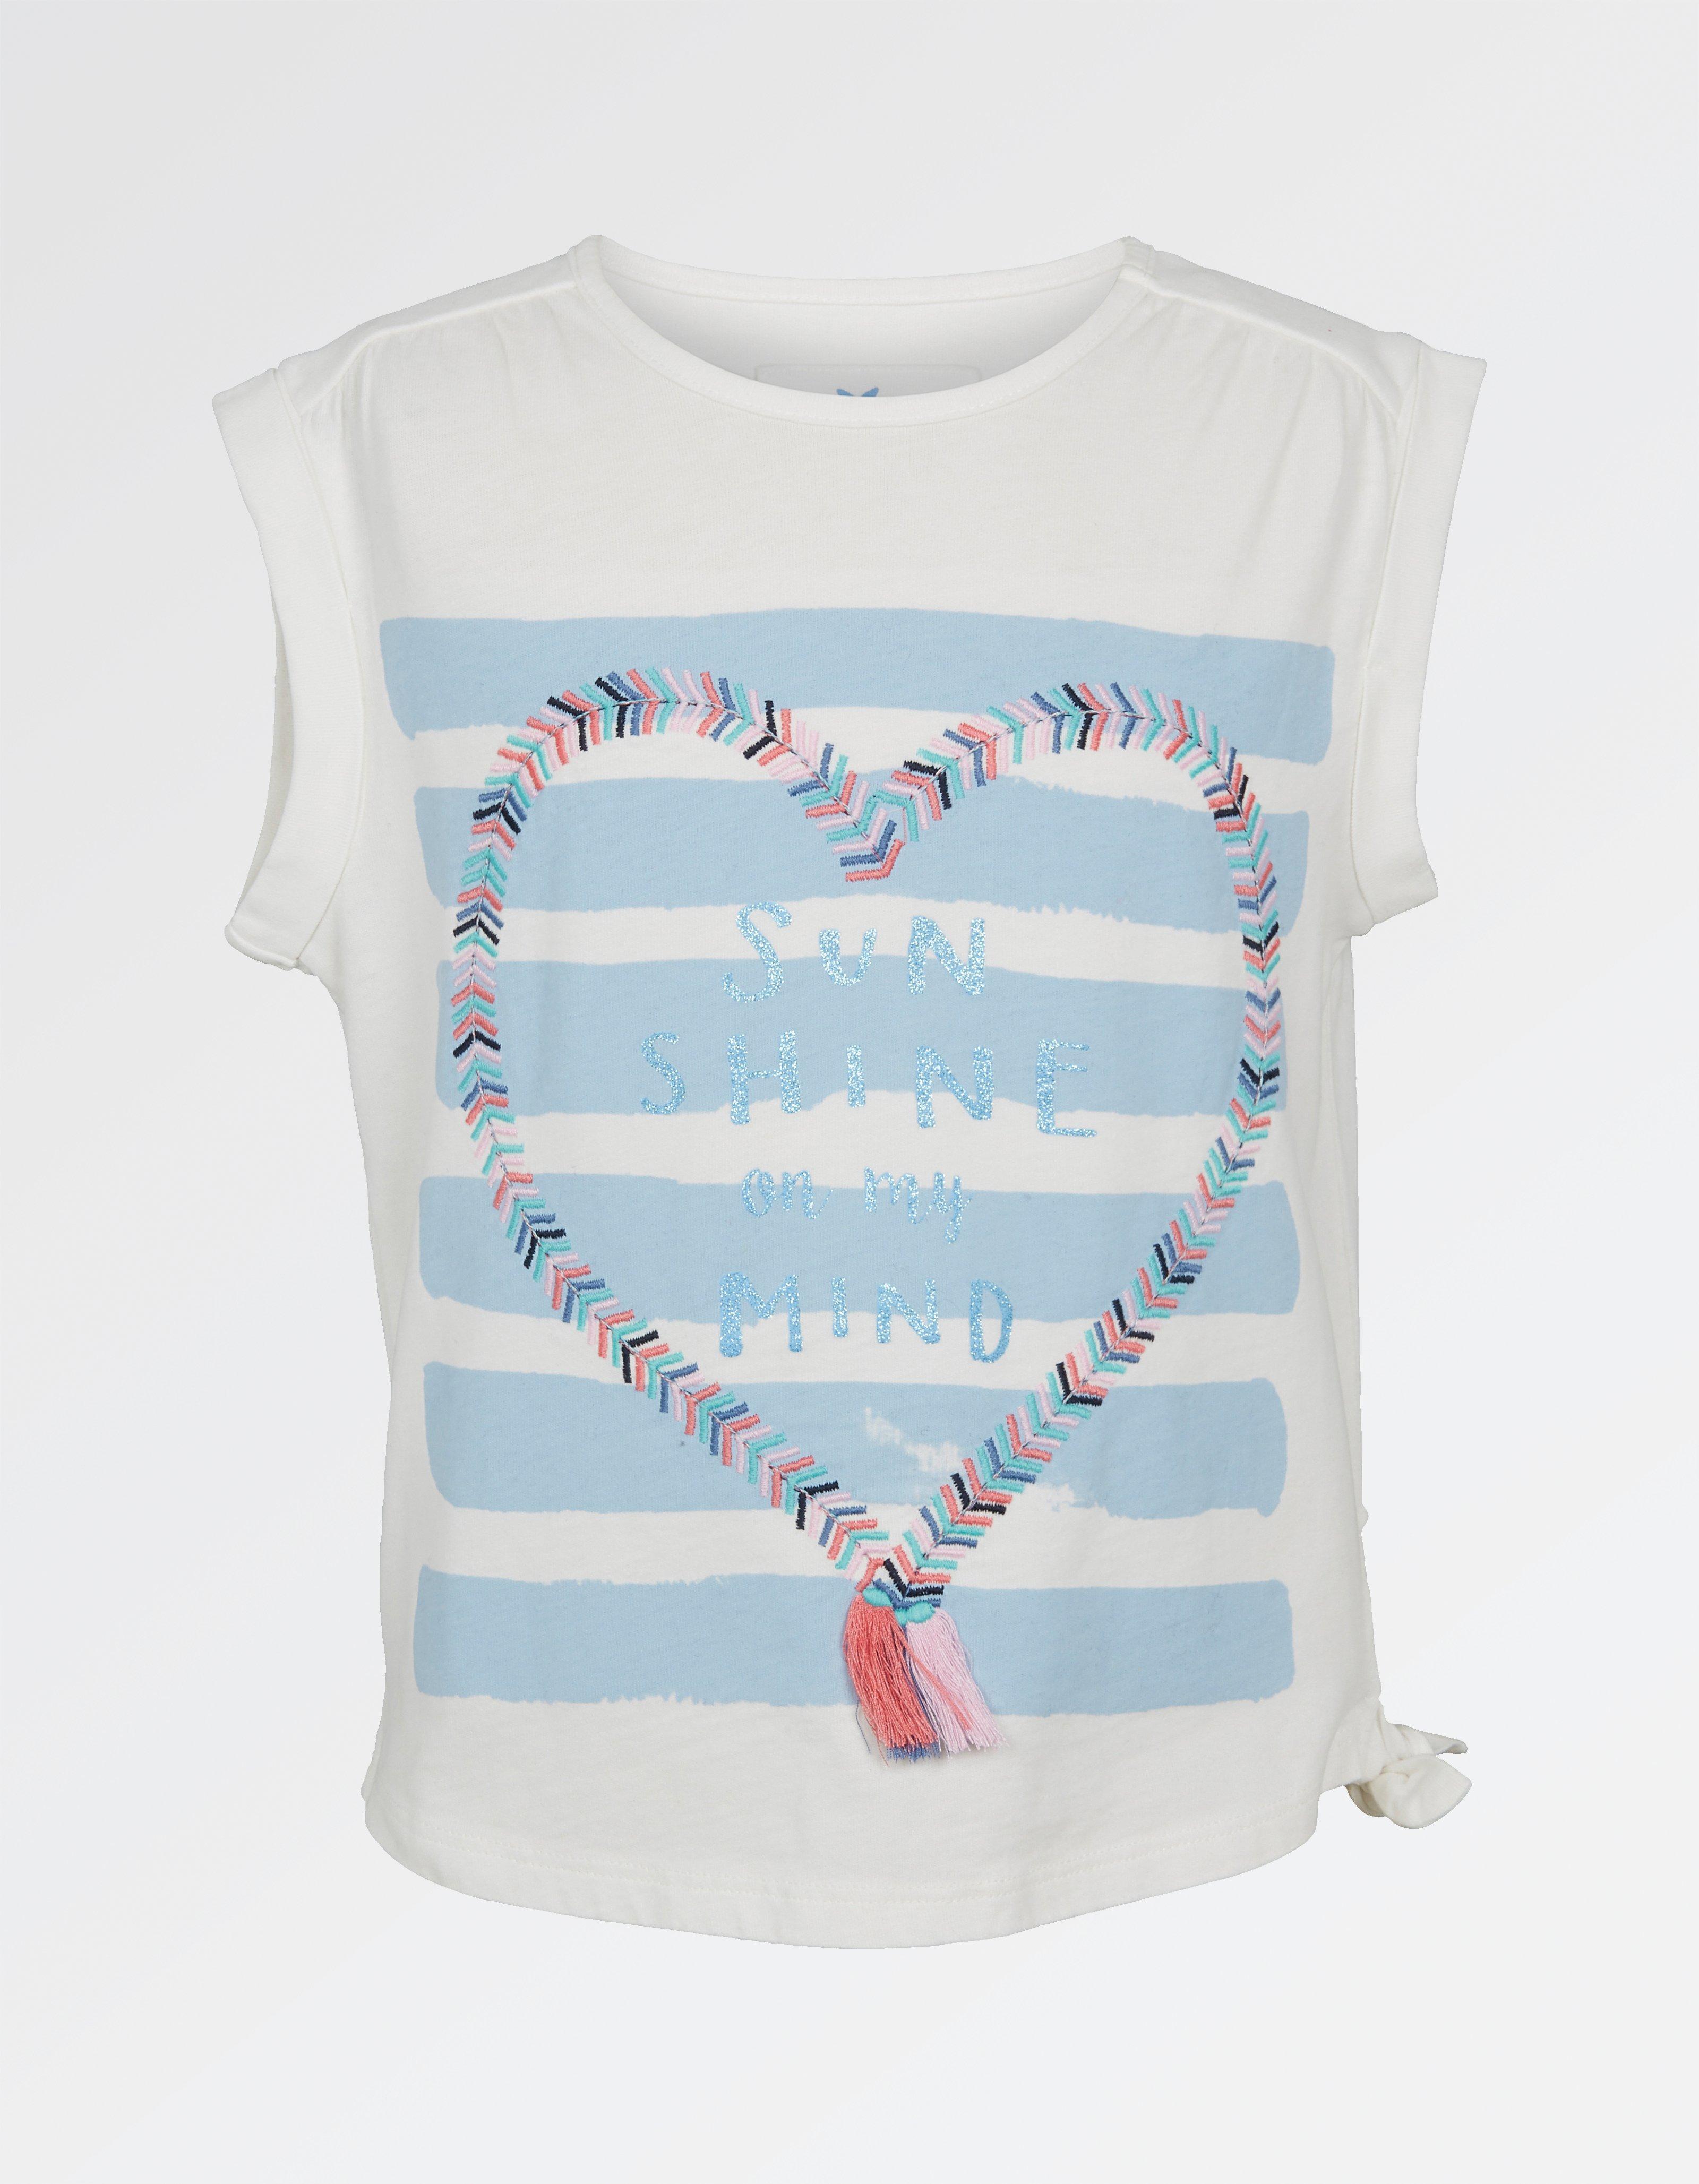 Friendship Bracelet T-Shirt